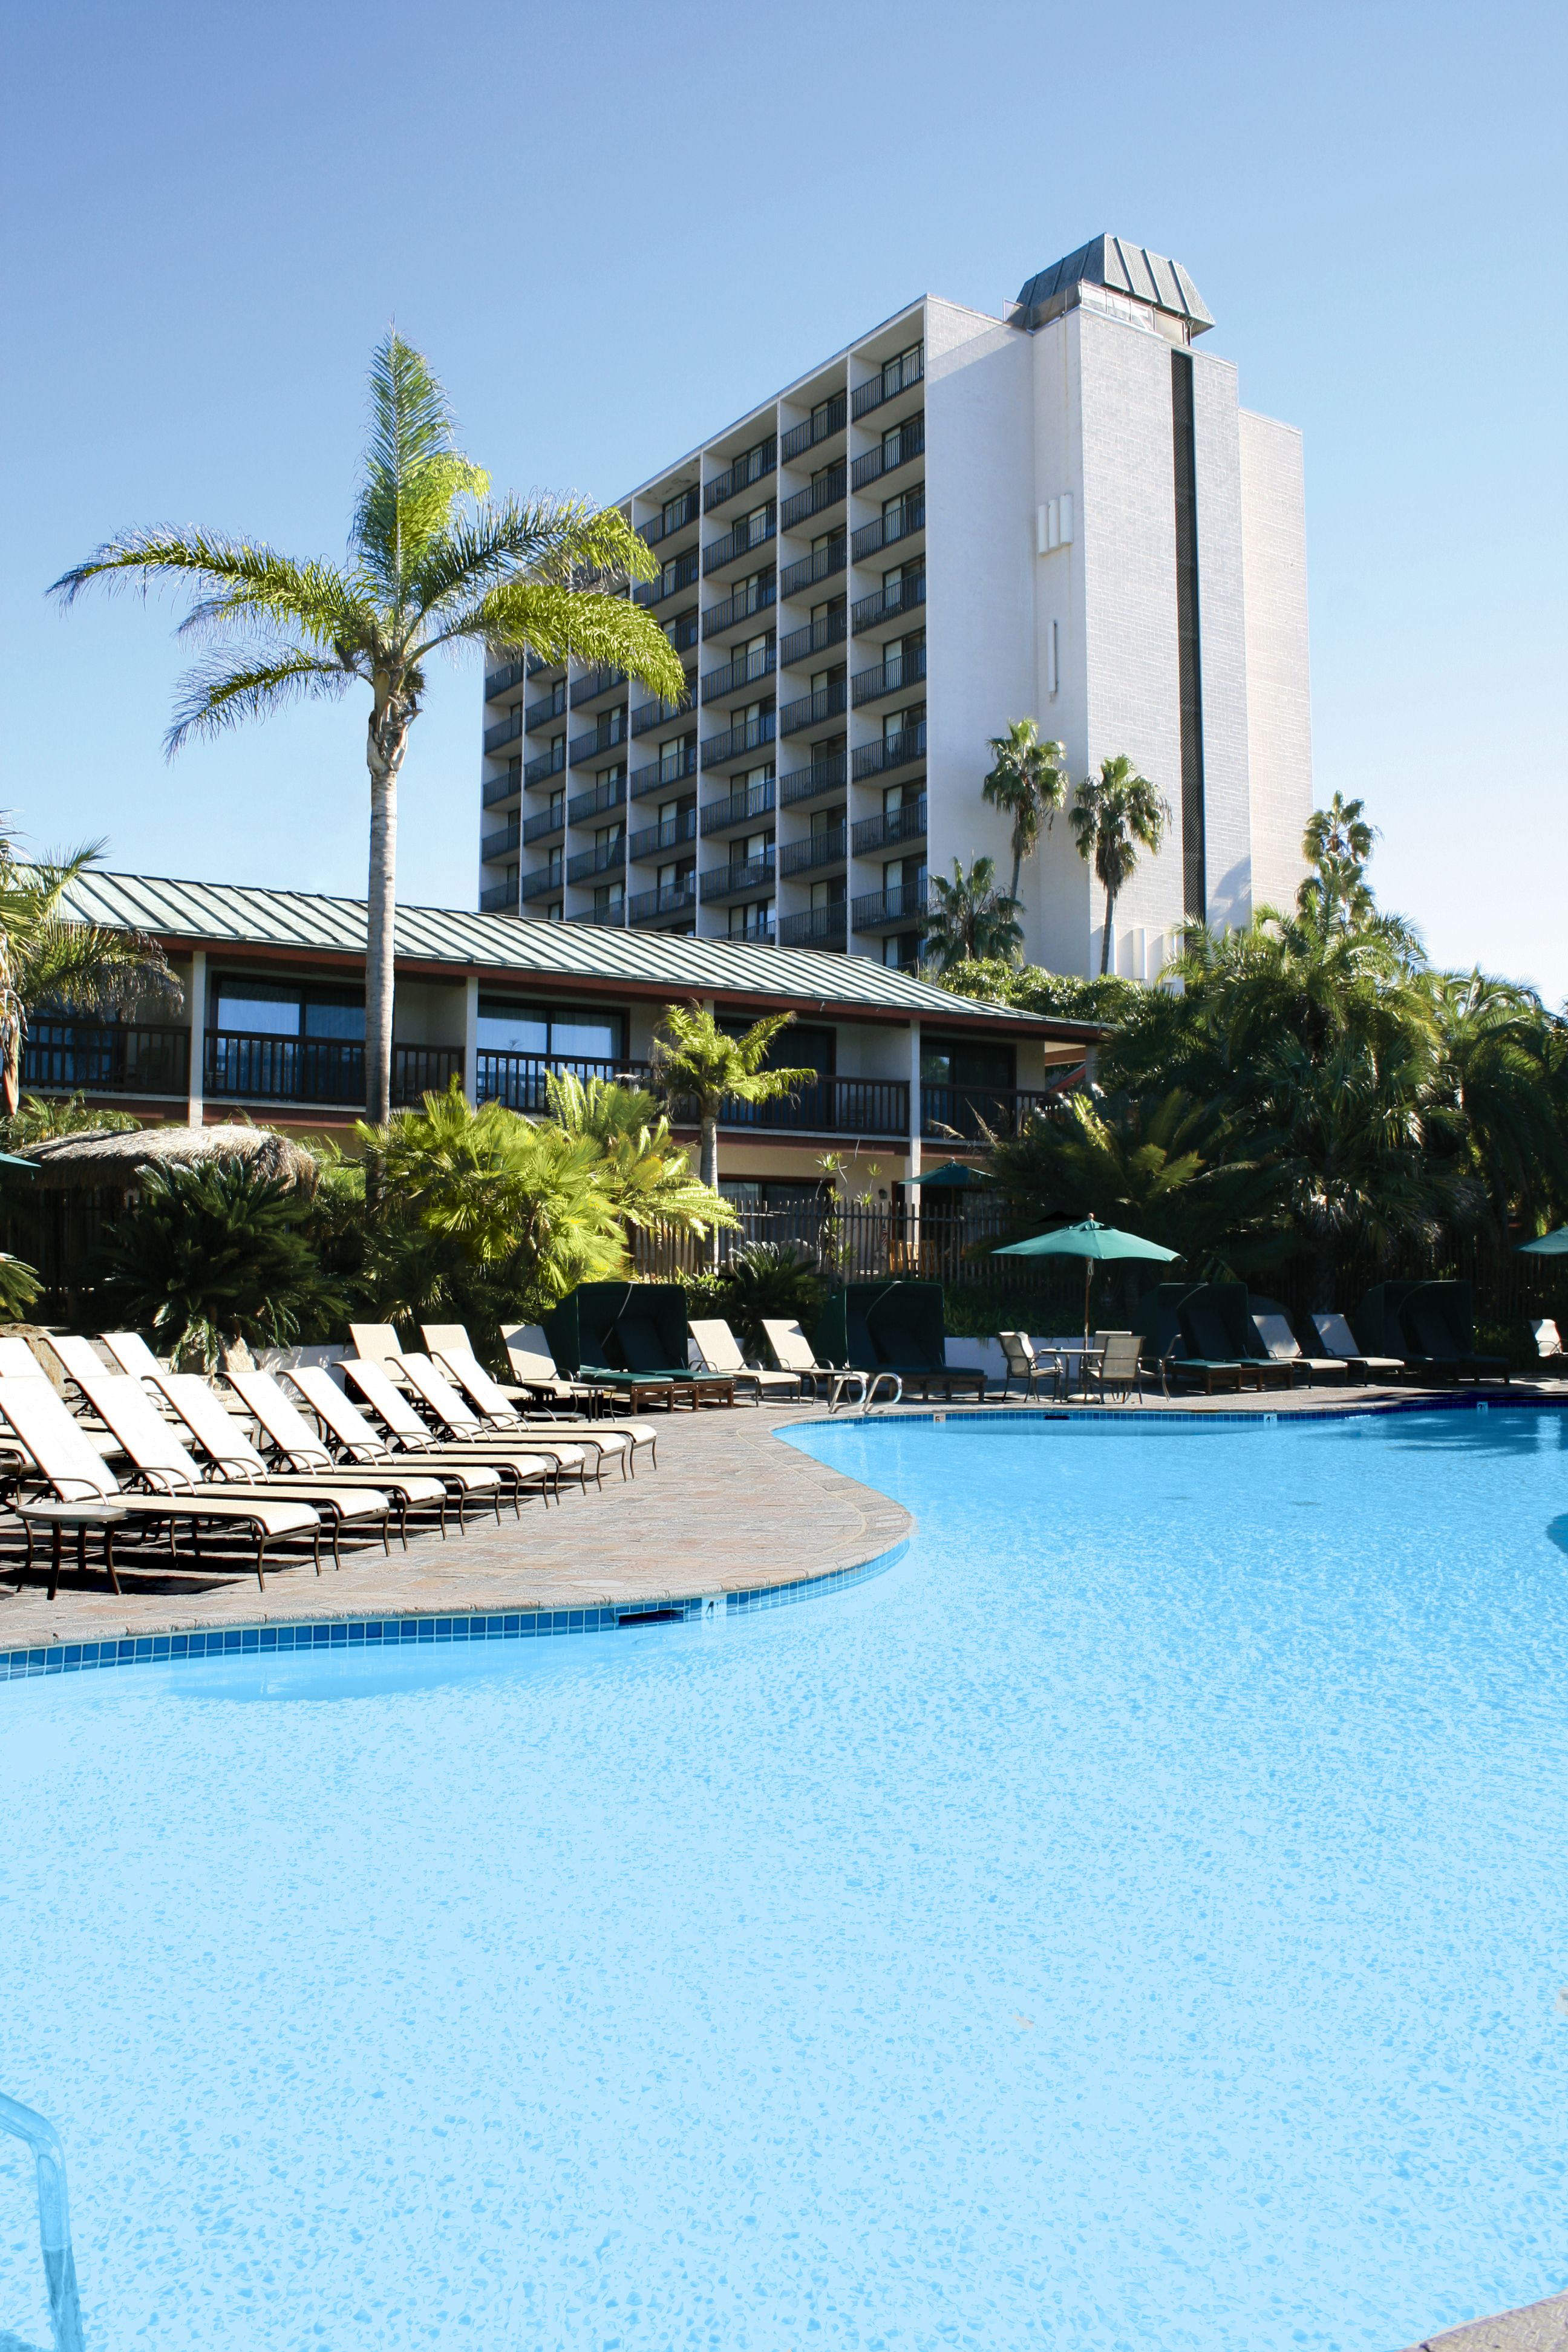 Catamaran Resort Hotel and Spa | Summertime Activities | San